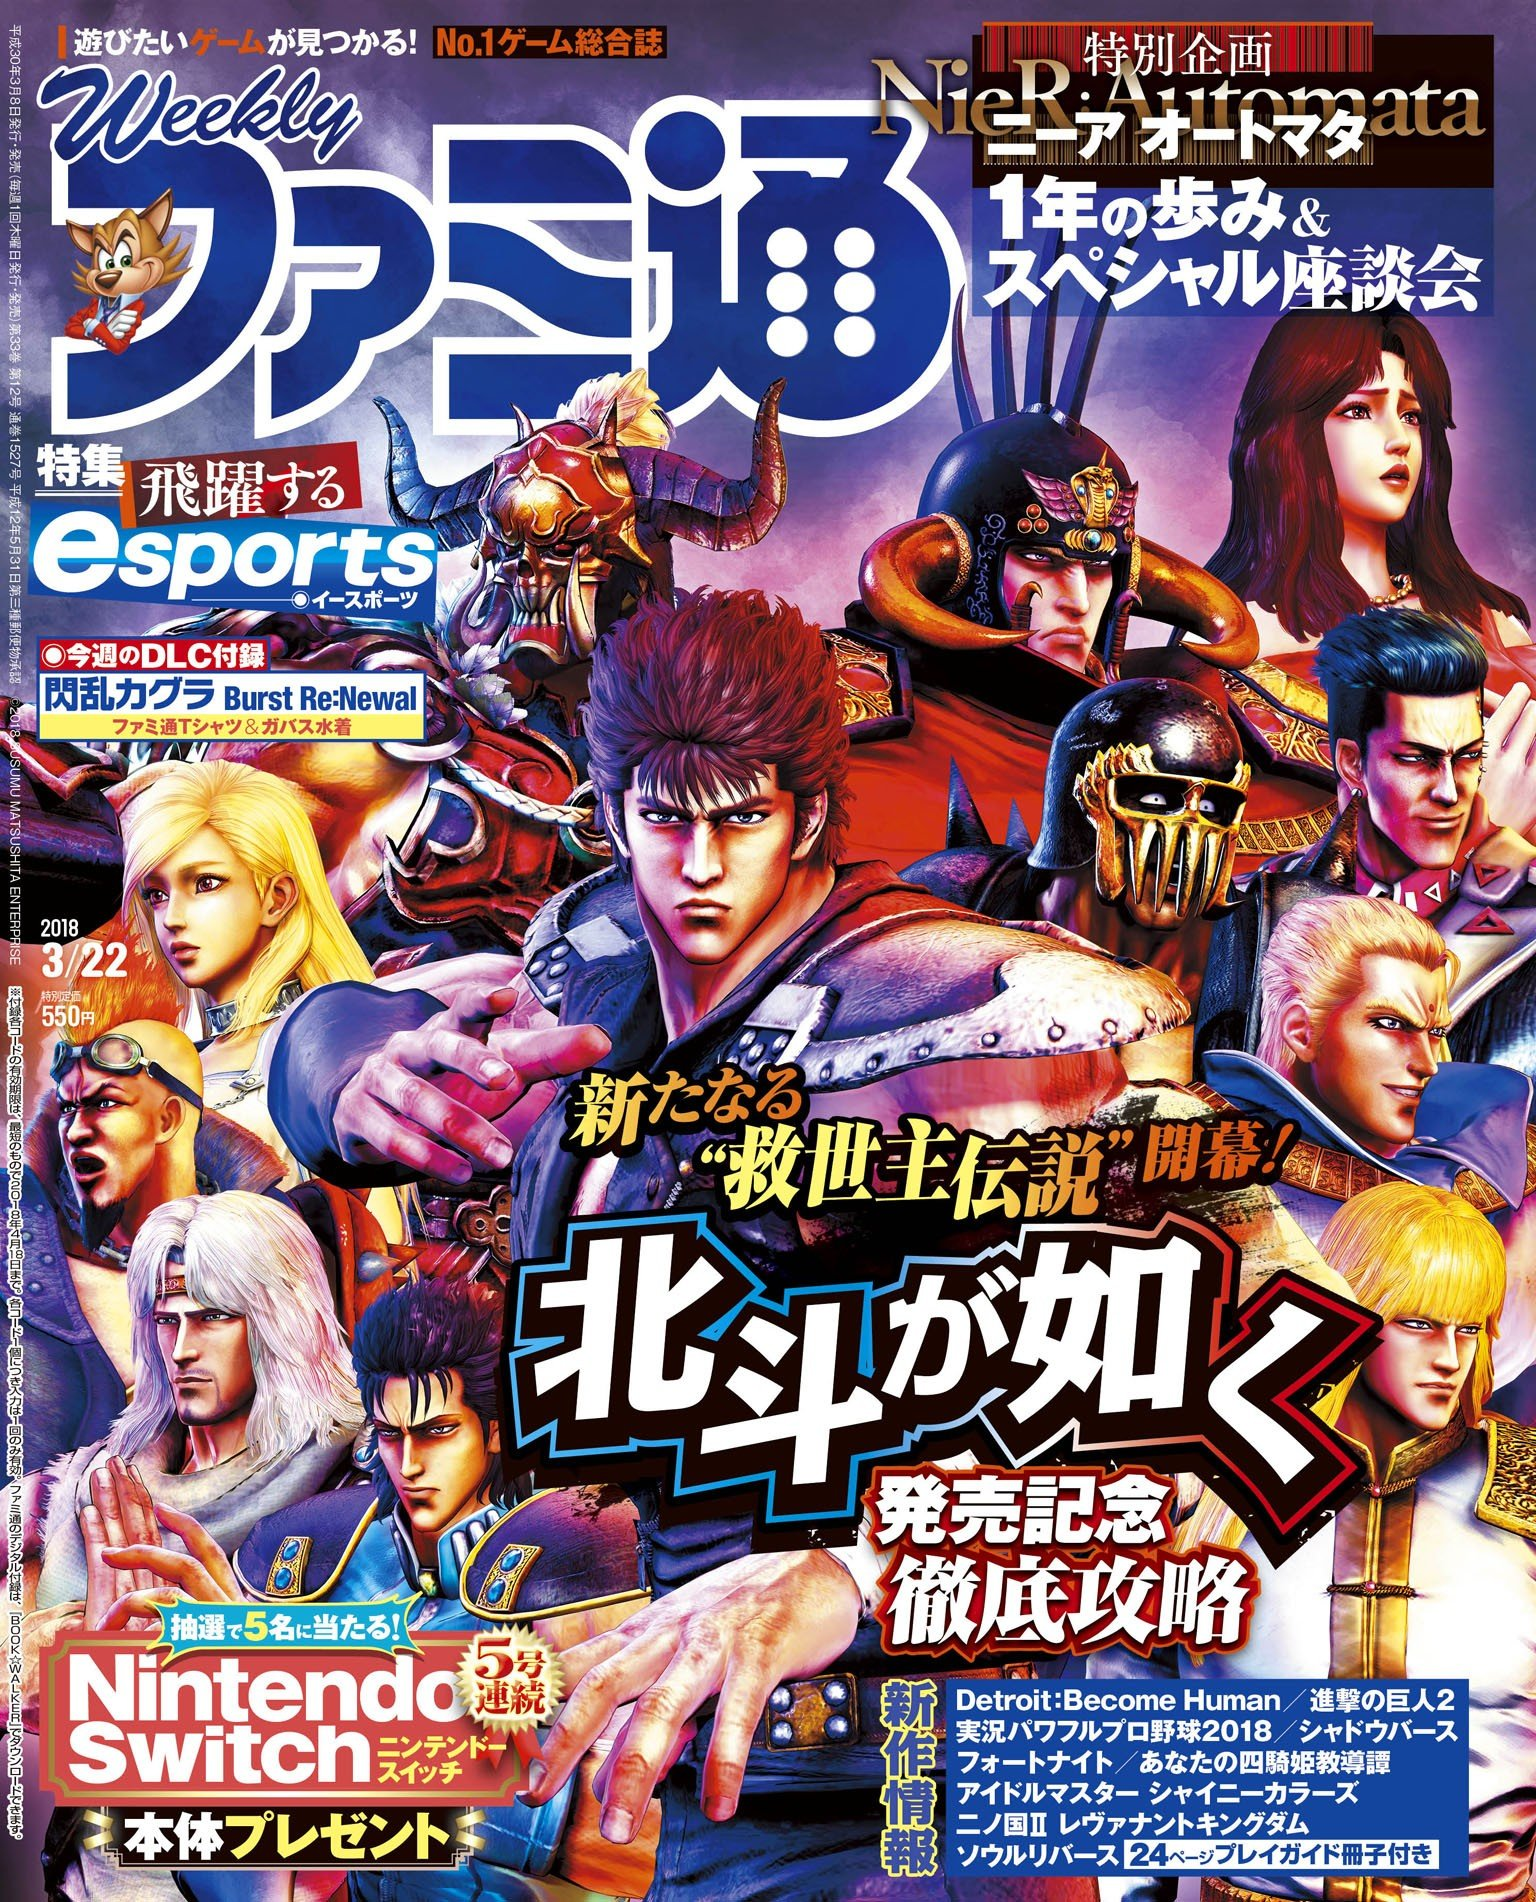 Famitsu 1527 (March 22, 2018)